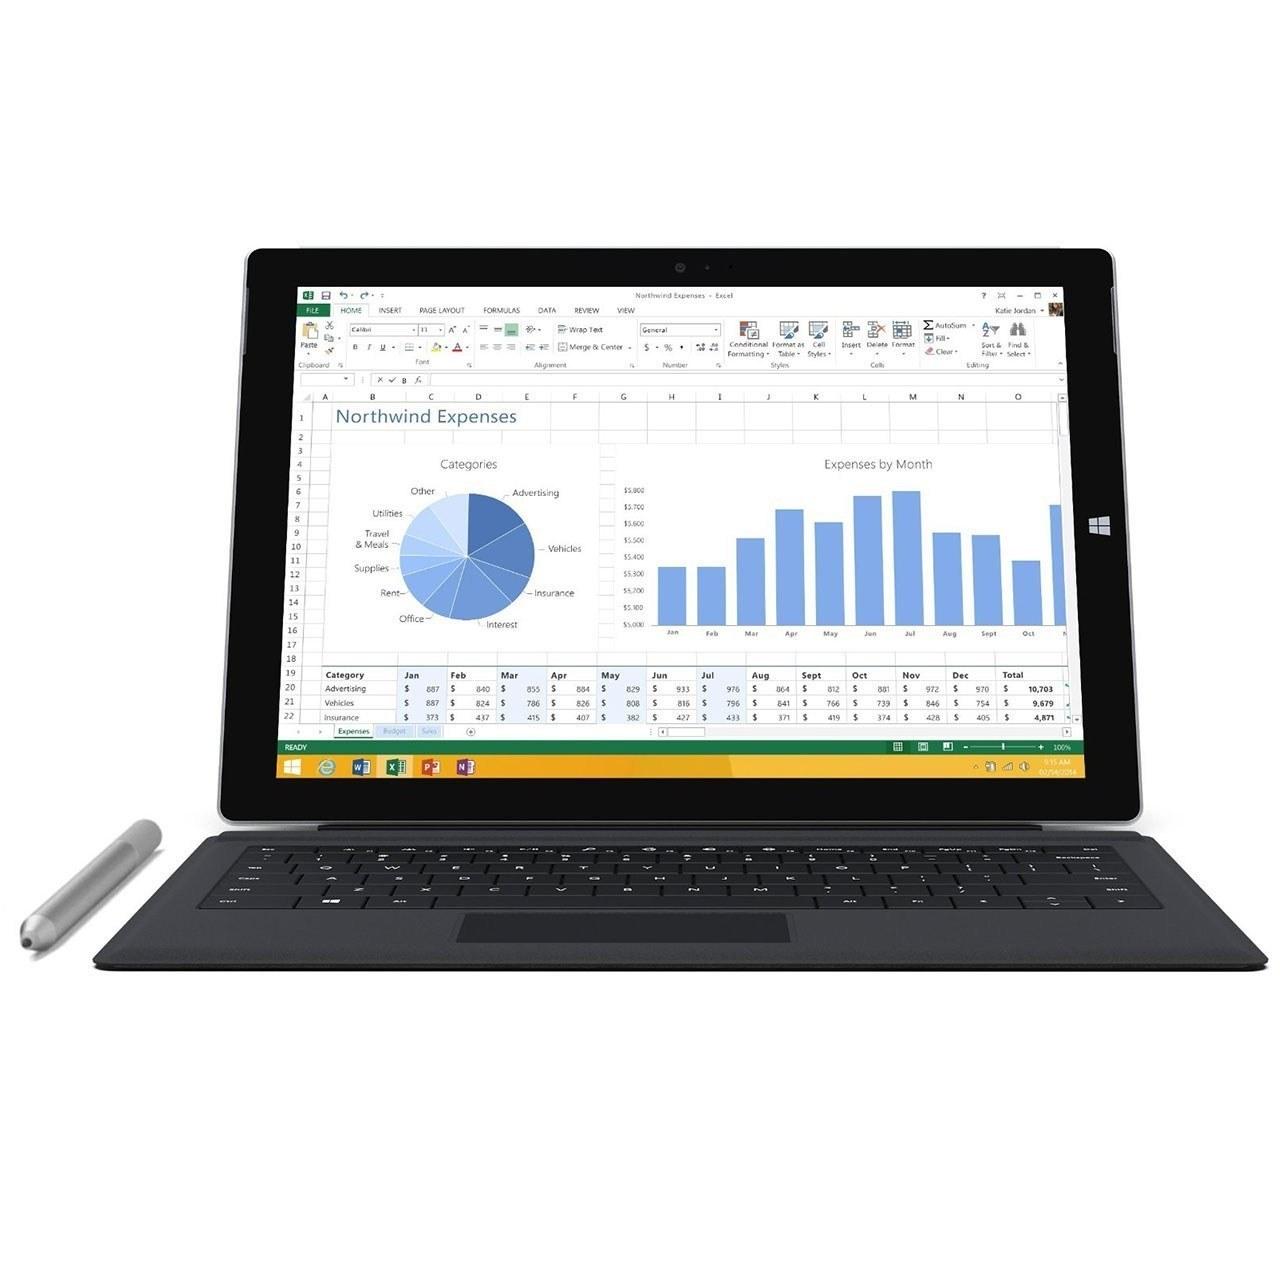 عکس تبلت مايکروسافت مدل Surface Pro 3 - A به همراه کيبورد ظرفيت 256 گيگابايت Microsoft Surface Pro 3 with Keyboard - A - 256GB Tablet تبلت-مایکروسافت-مدل-surface-pro-3-a-به-همراه-کیبورد-ظرفیت-256-گیگابایت 0